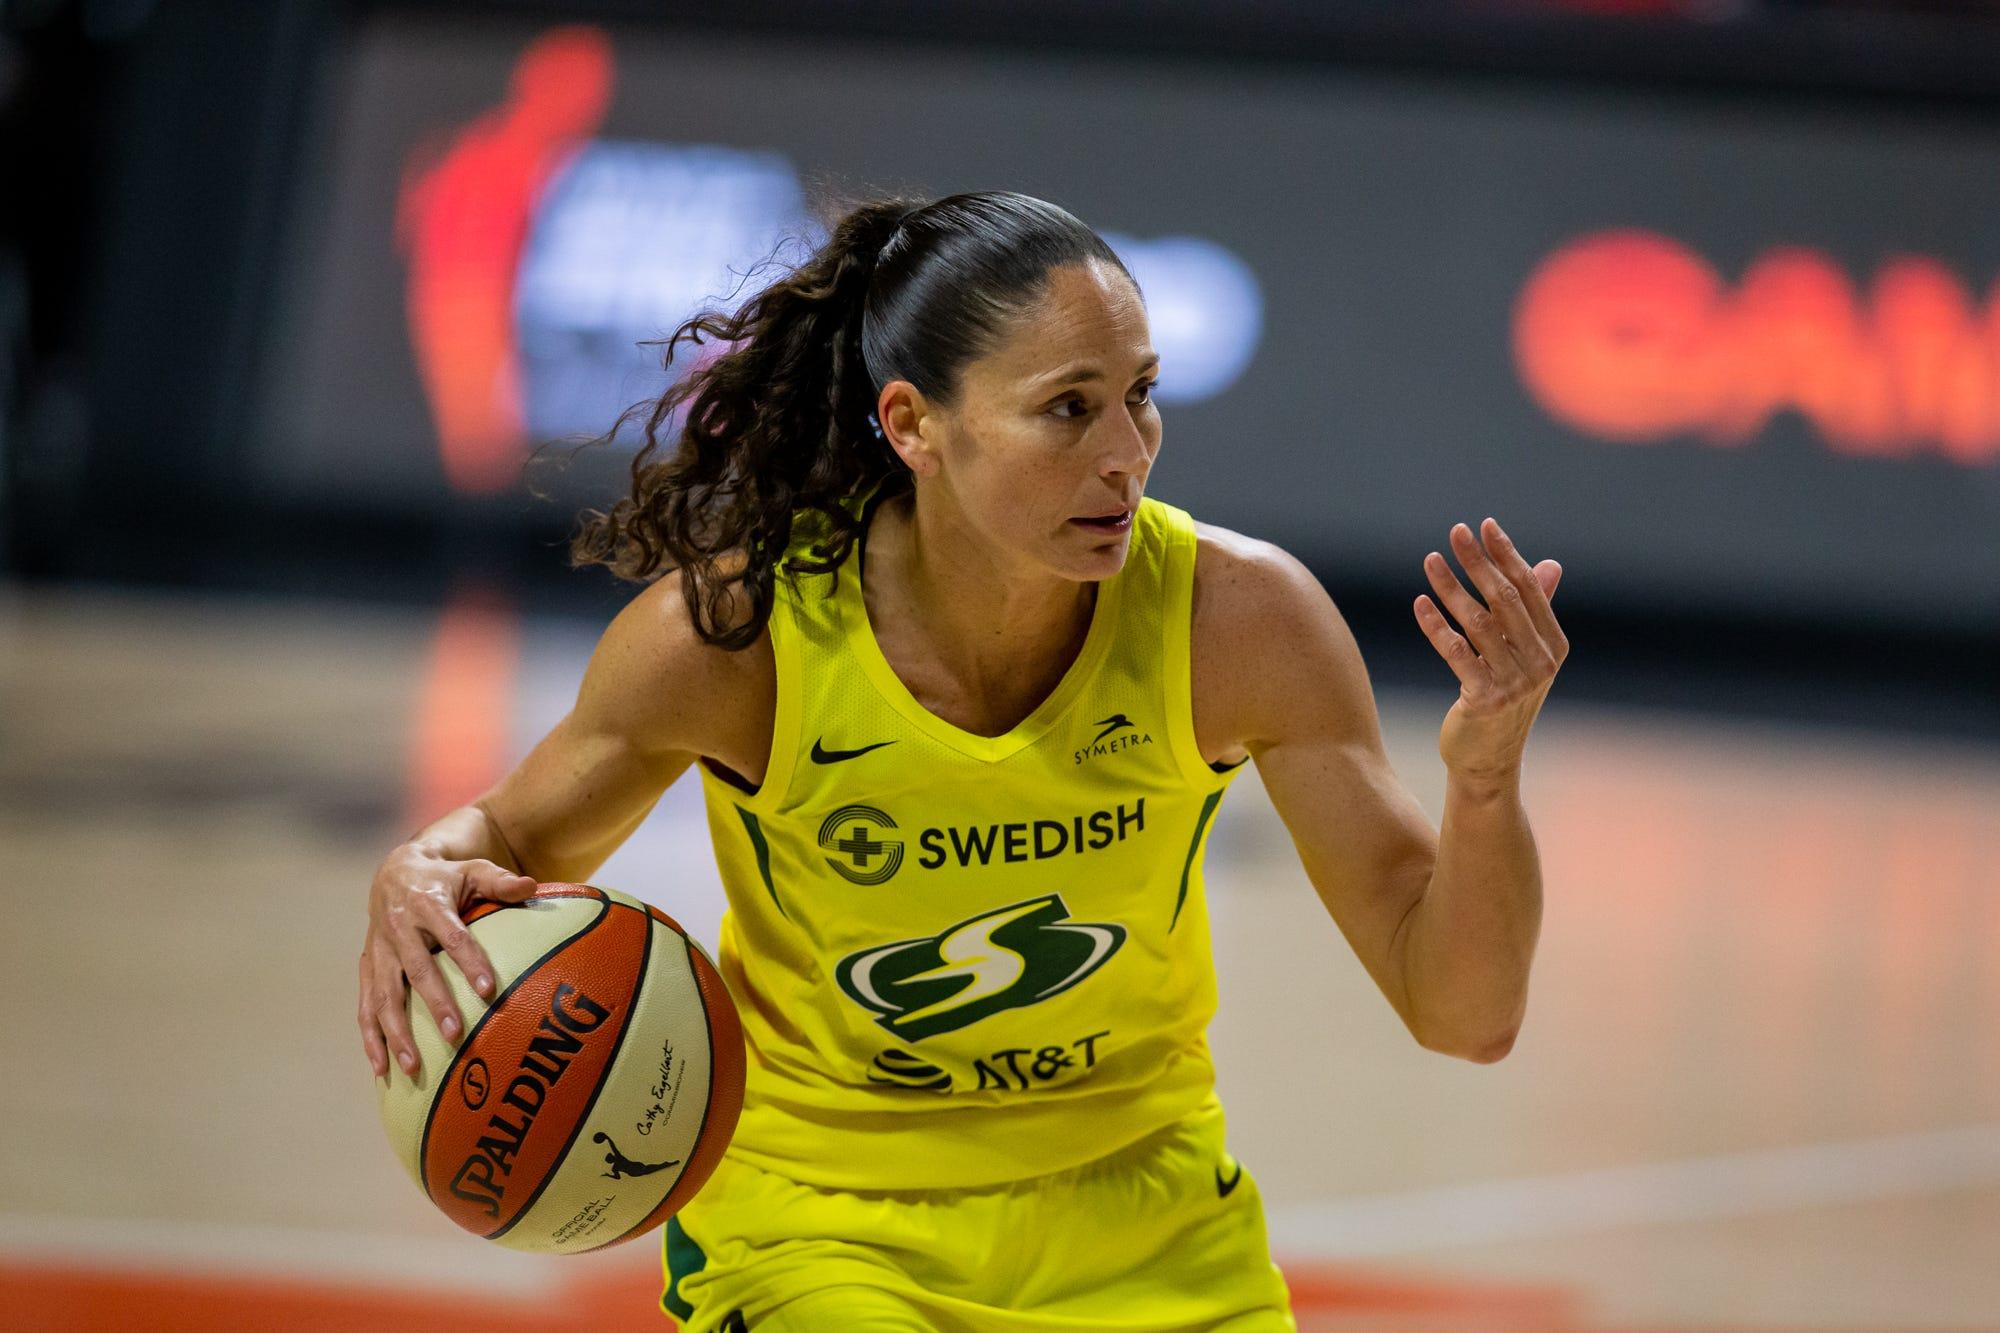 WNBA star Sue Bird says perception of 'cute white girls' helps U.S. women's soccer